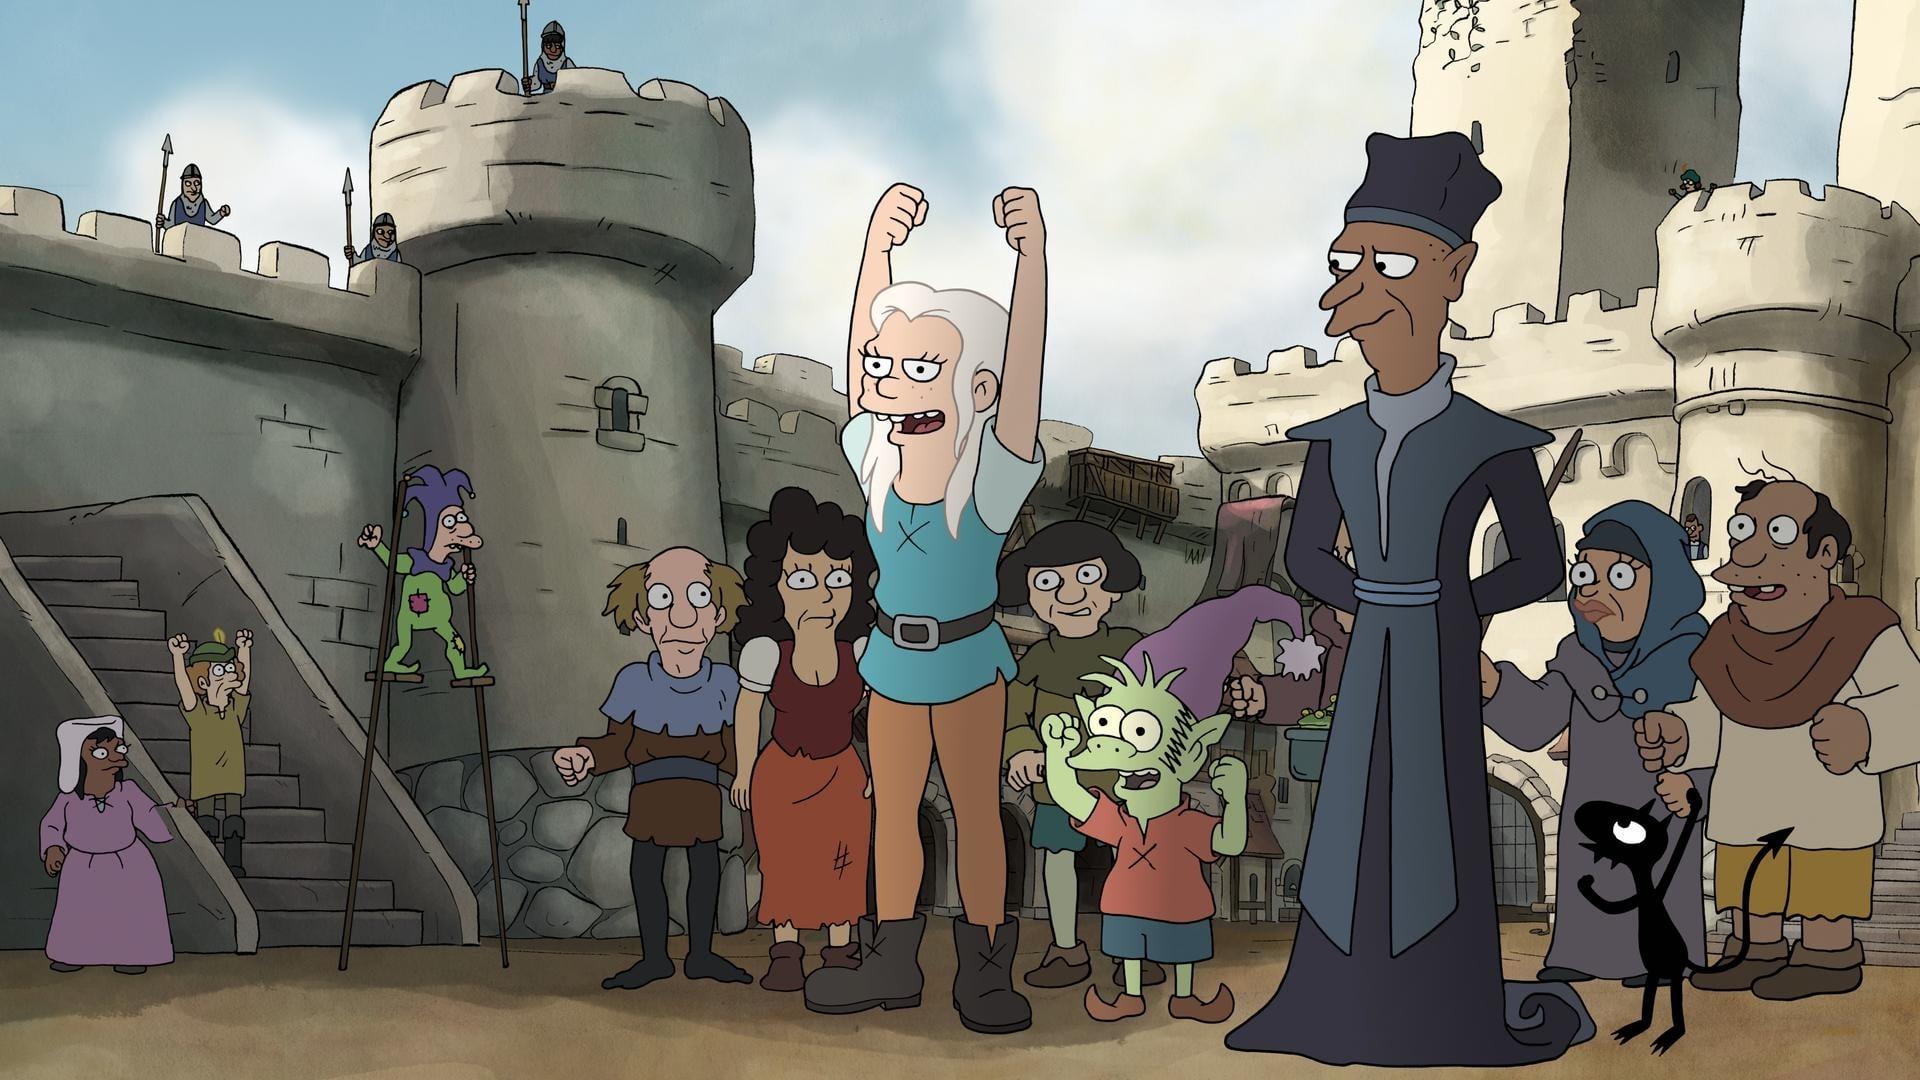 Disenchanment, Matt Groening, The Simpsons, Netflix TV Series, Princess Bean, Elfo, Lucio